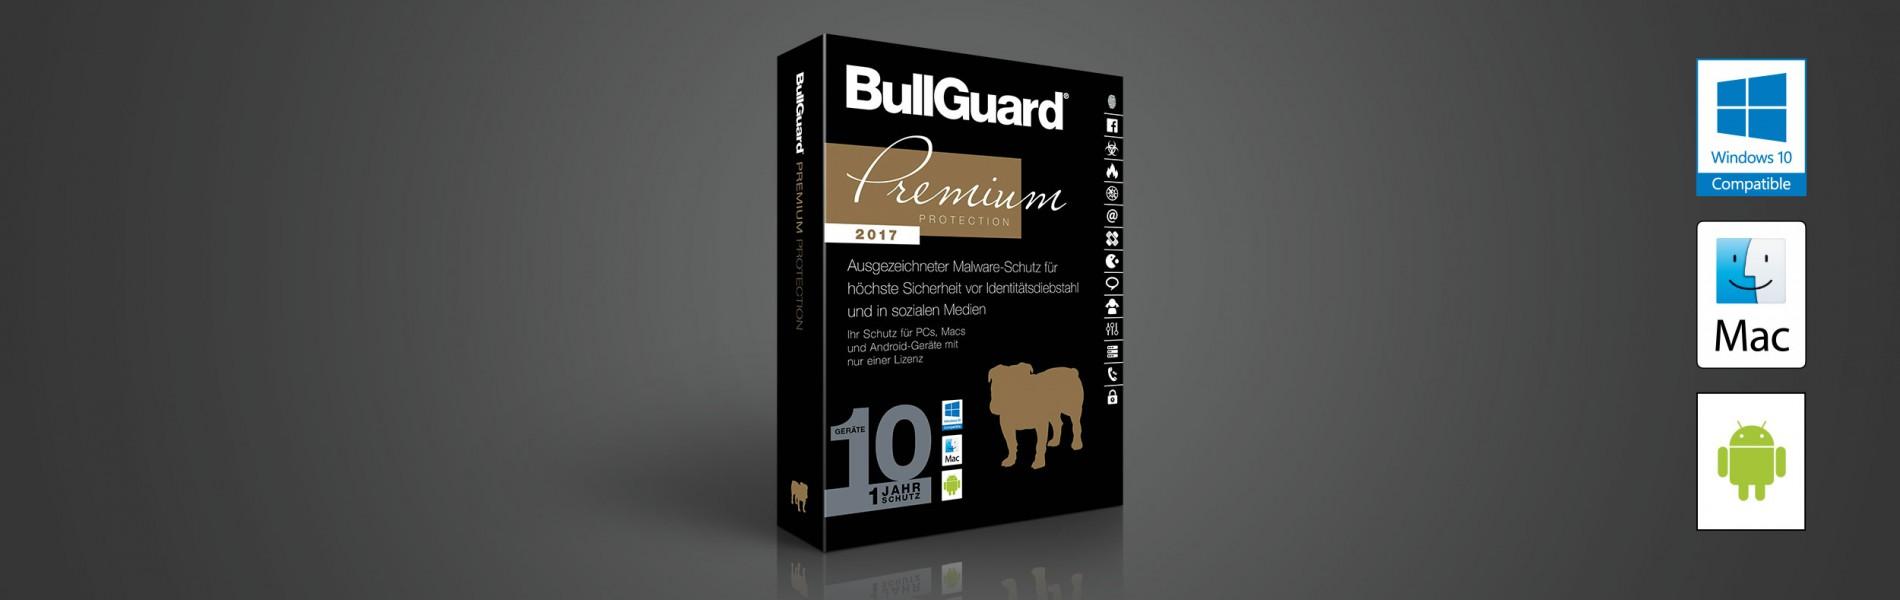 BullGuard Premium Protection 2017